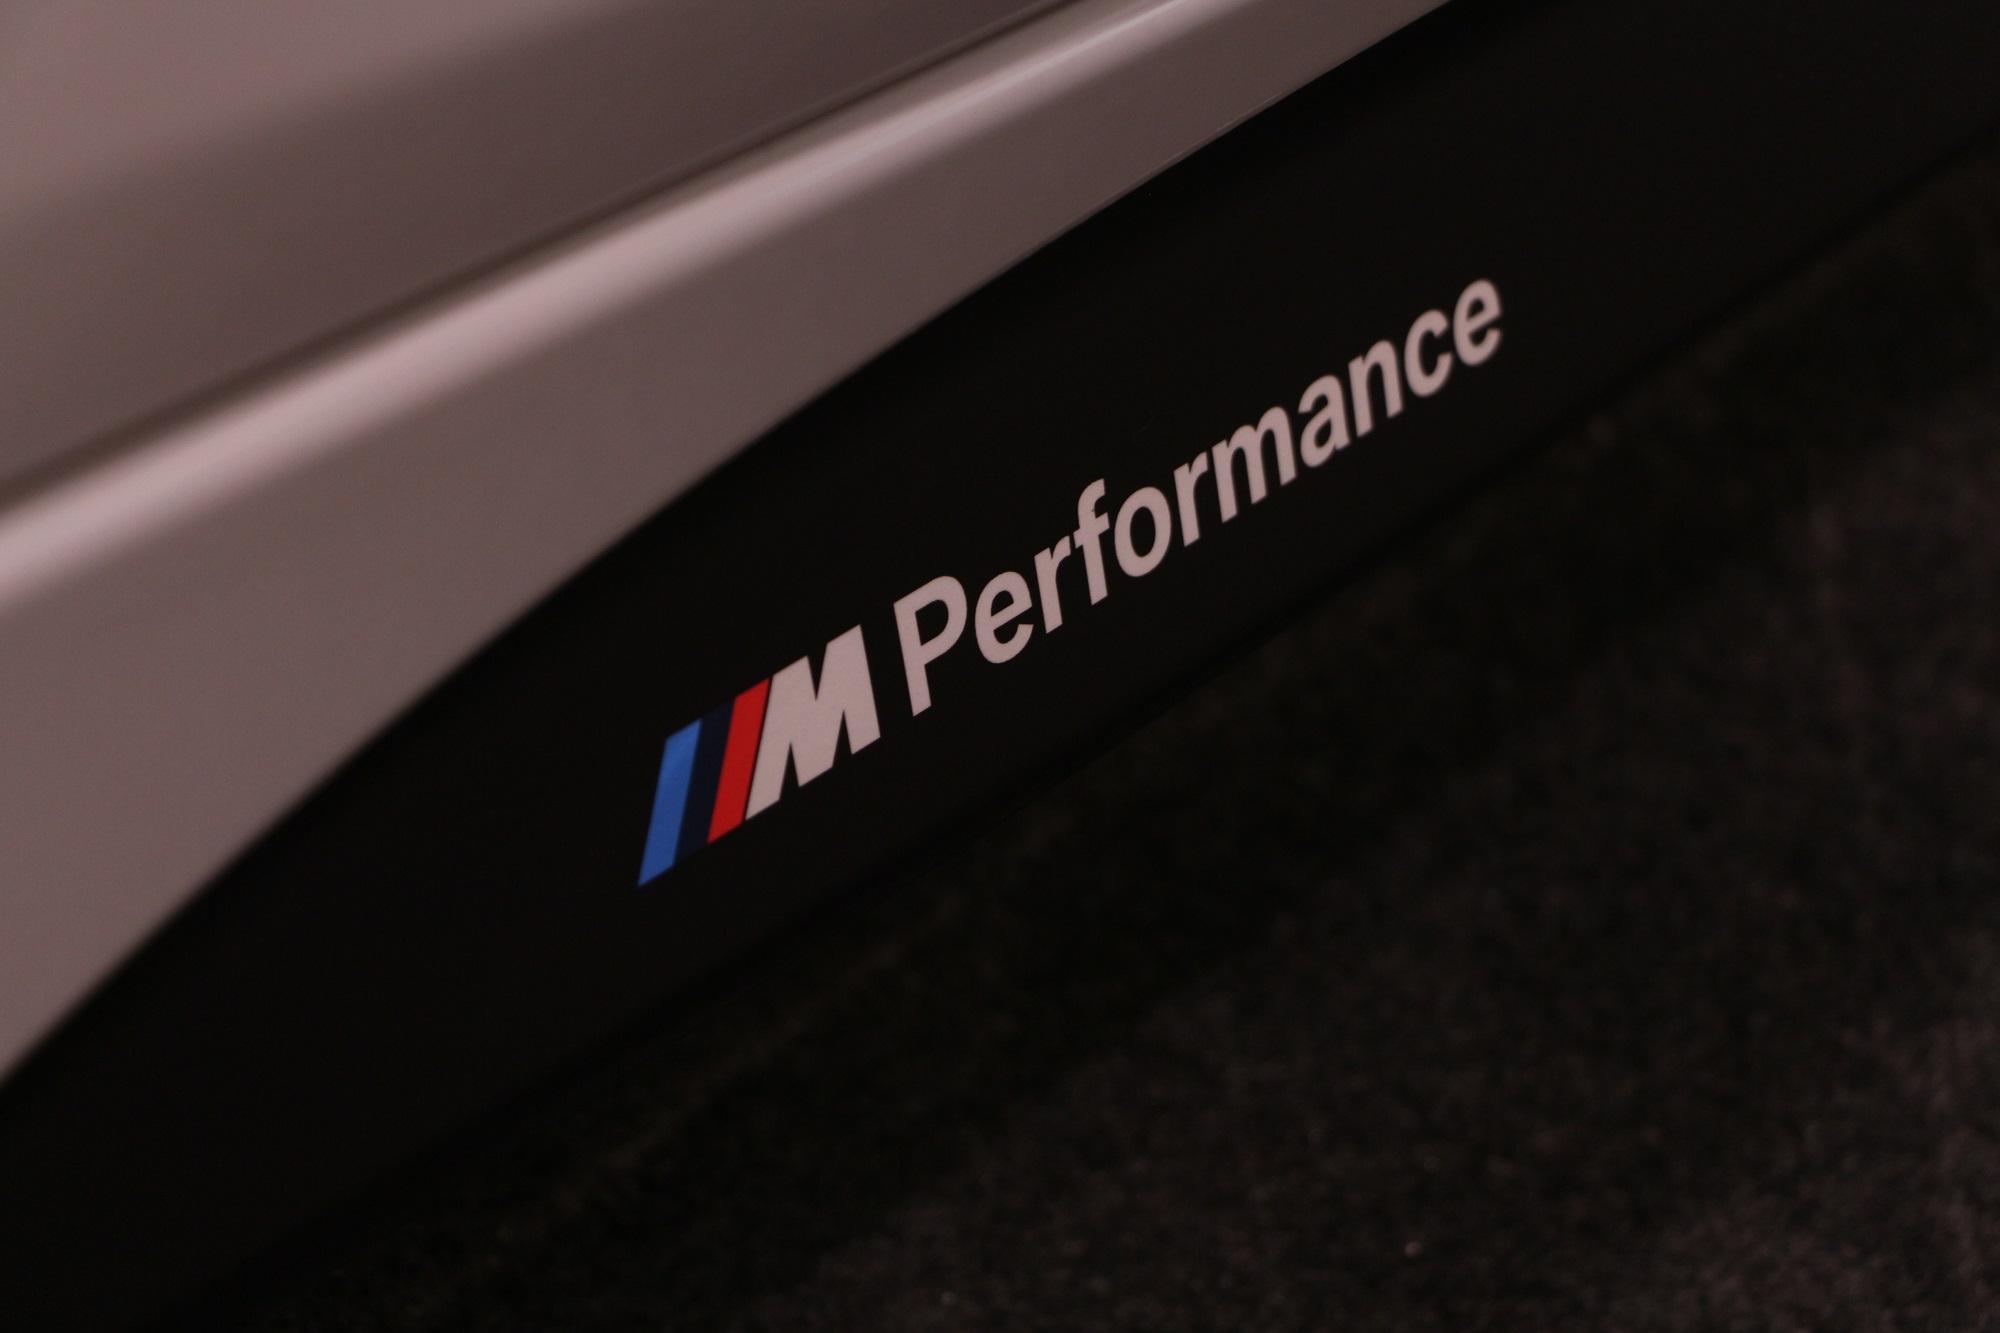 6SpeedOnline.com BMW Dinan 340i S3 SEMA 2017 3D Printed